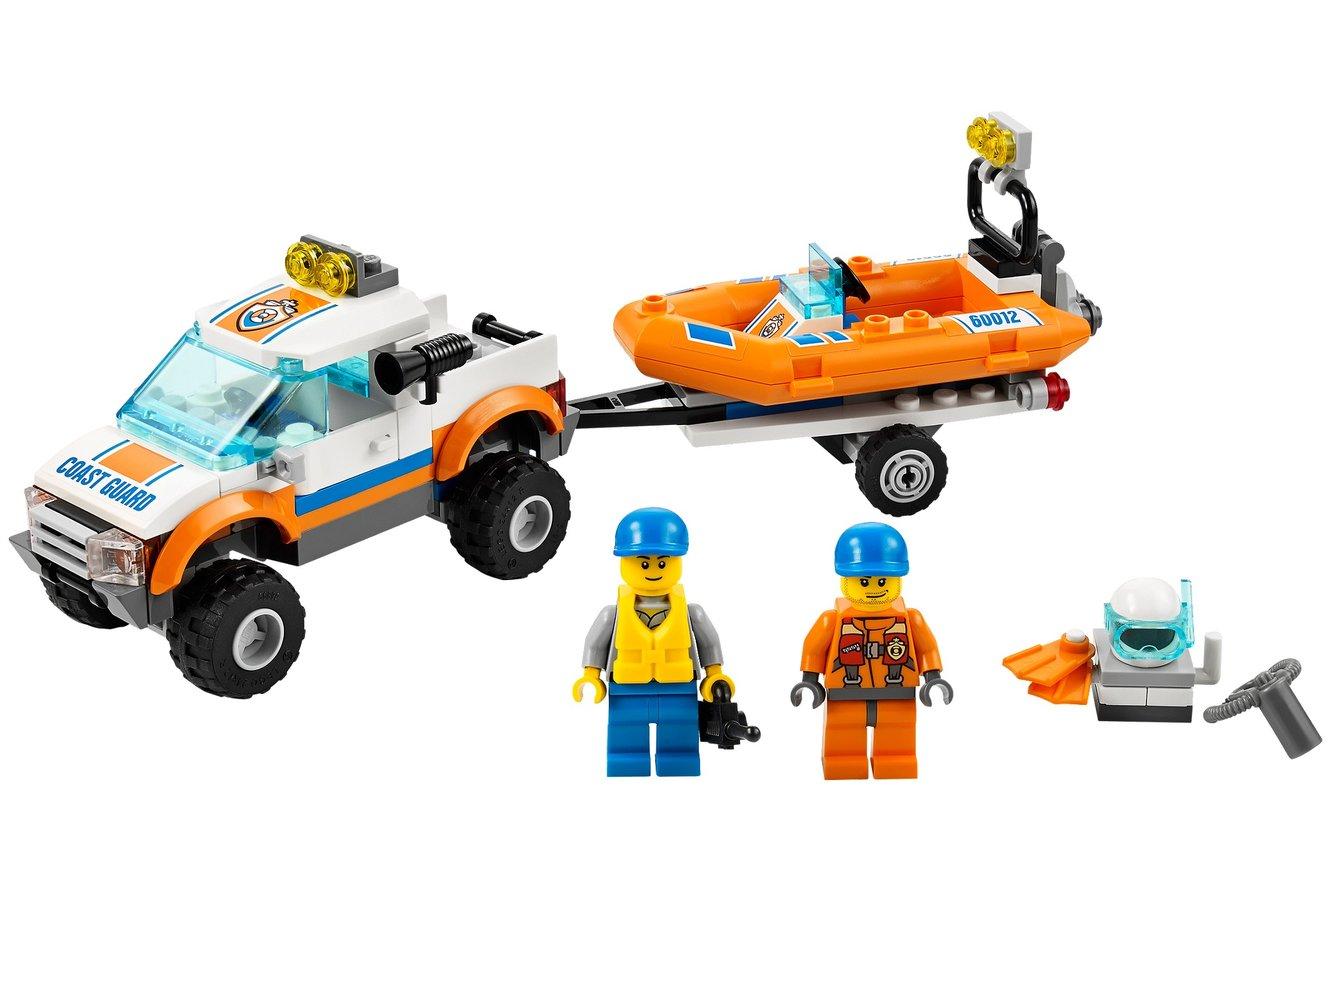 Coast Guard 4 x 4